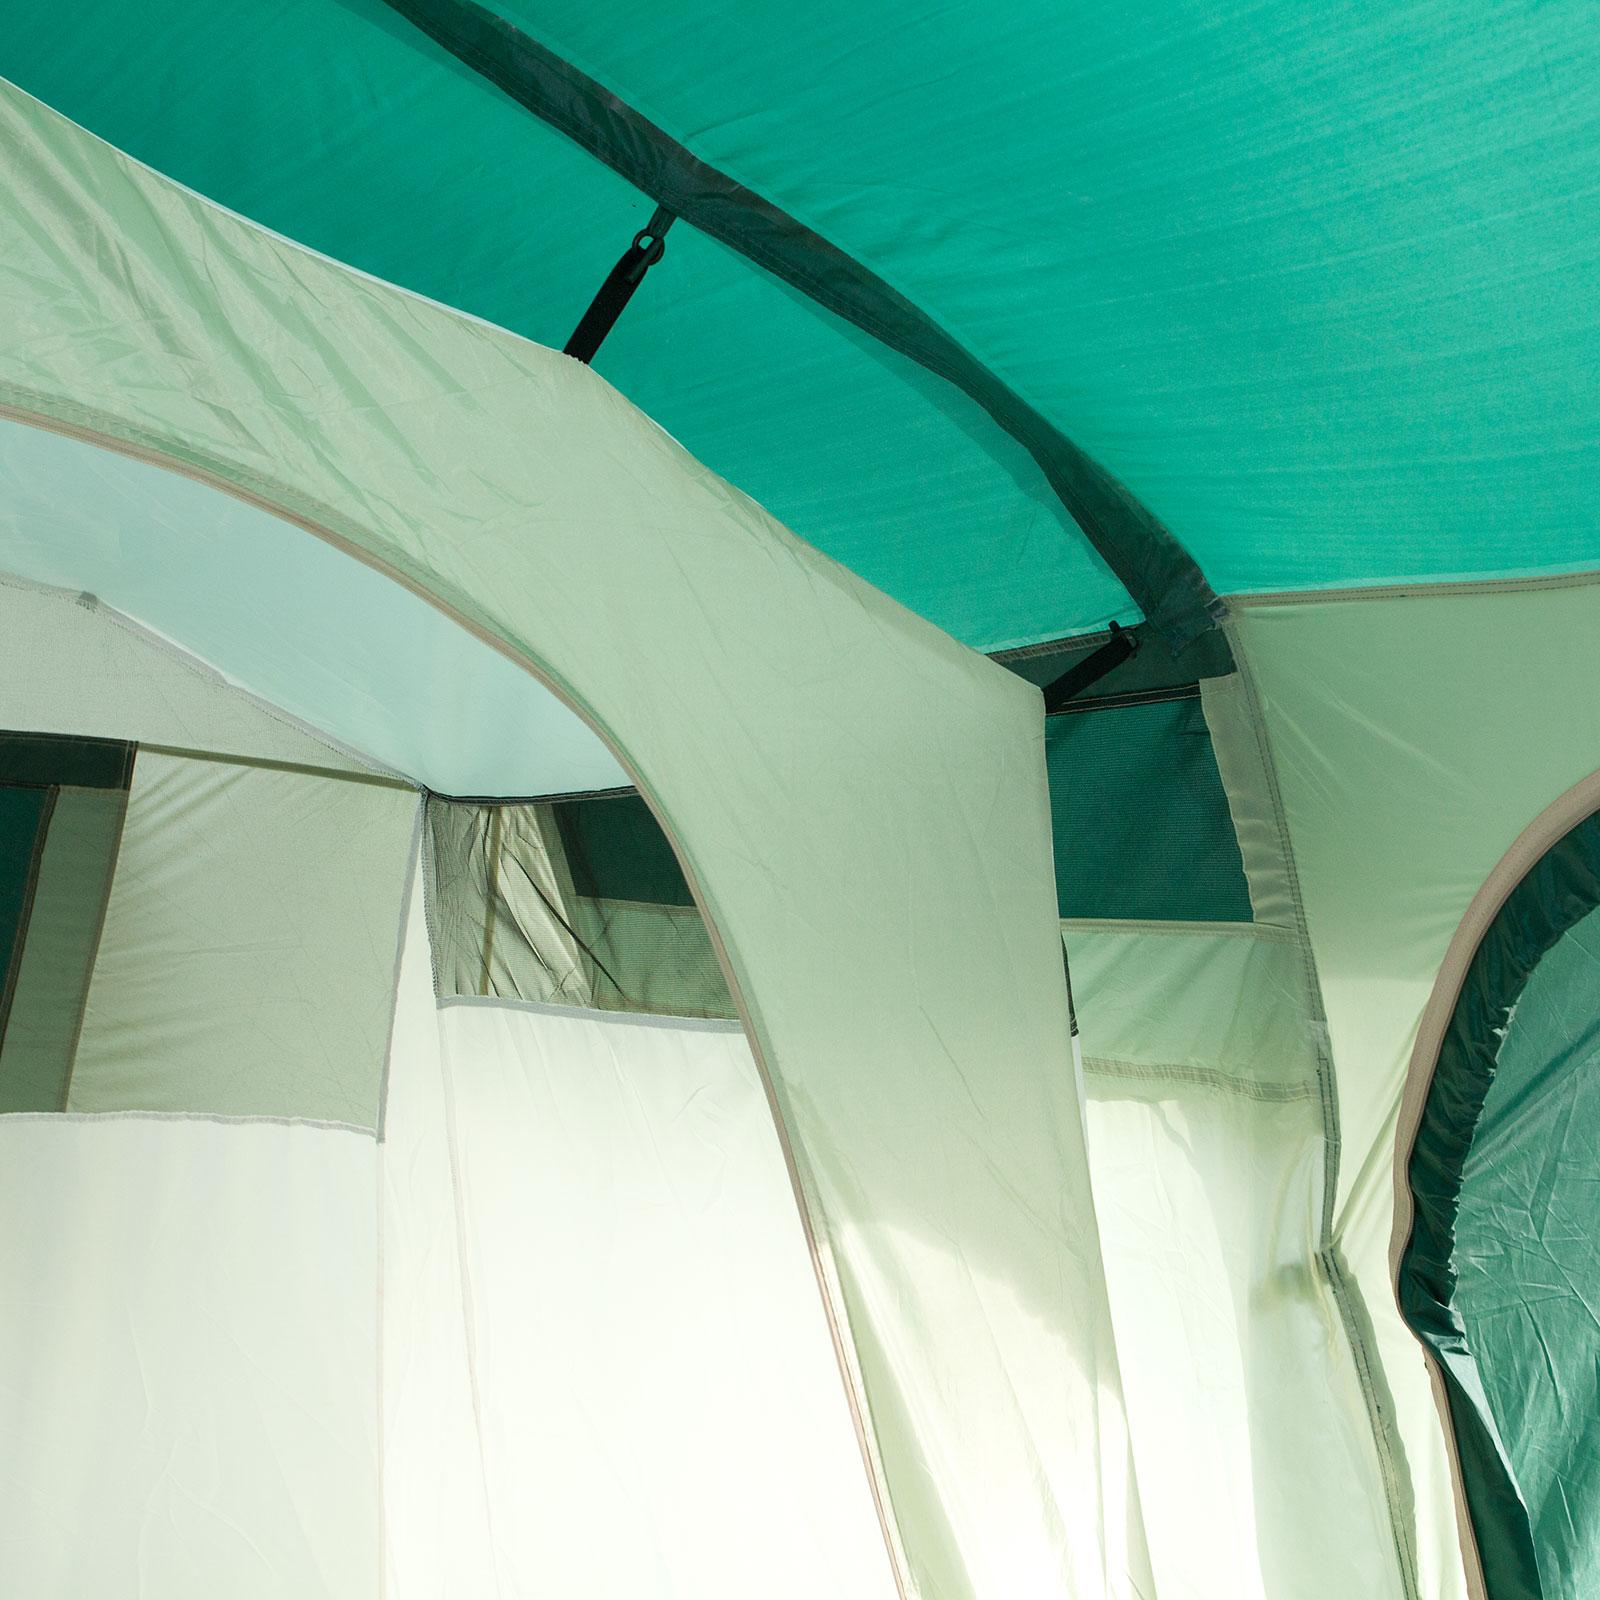 SKANDIKA-HURRICANE-TENTE-FAMILLE-CAMPING-8-PERS-650x310CM-4-CABINES-NEUF